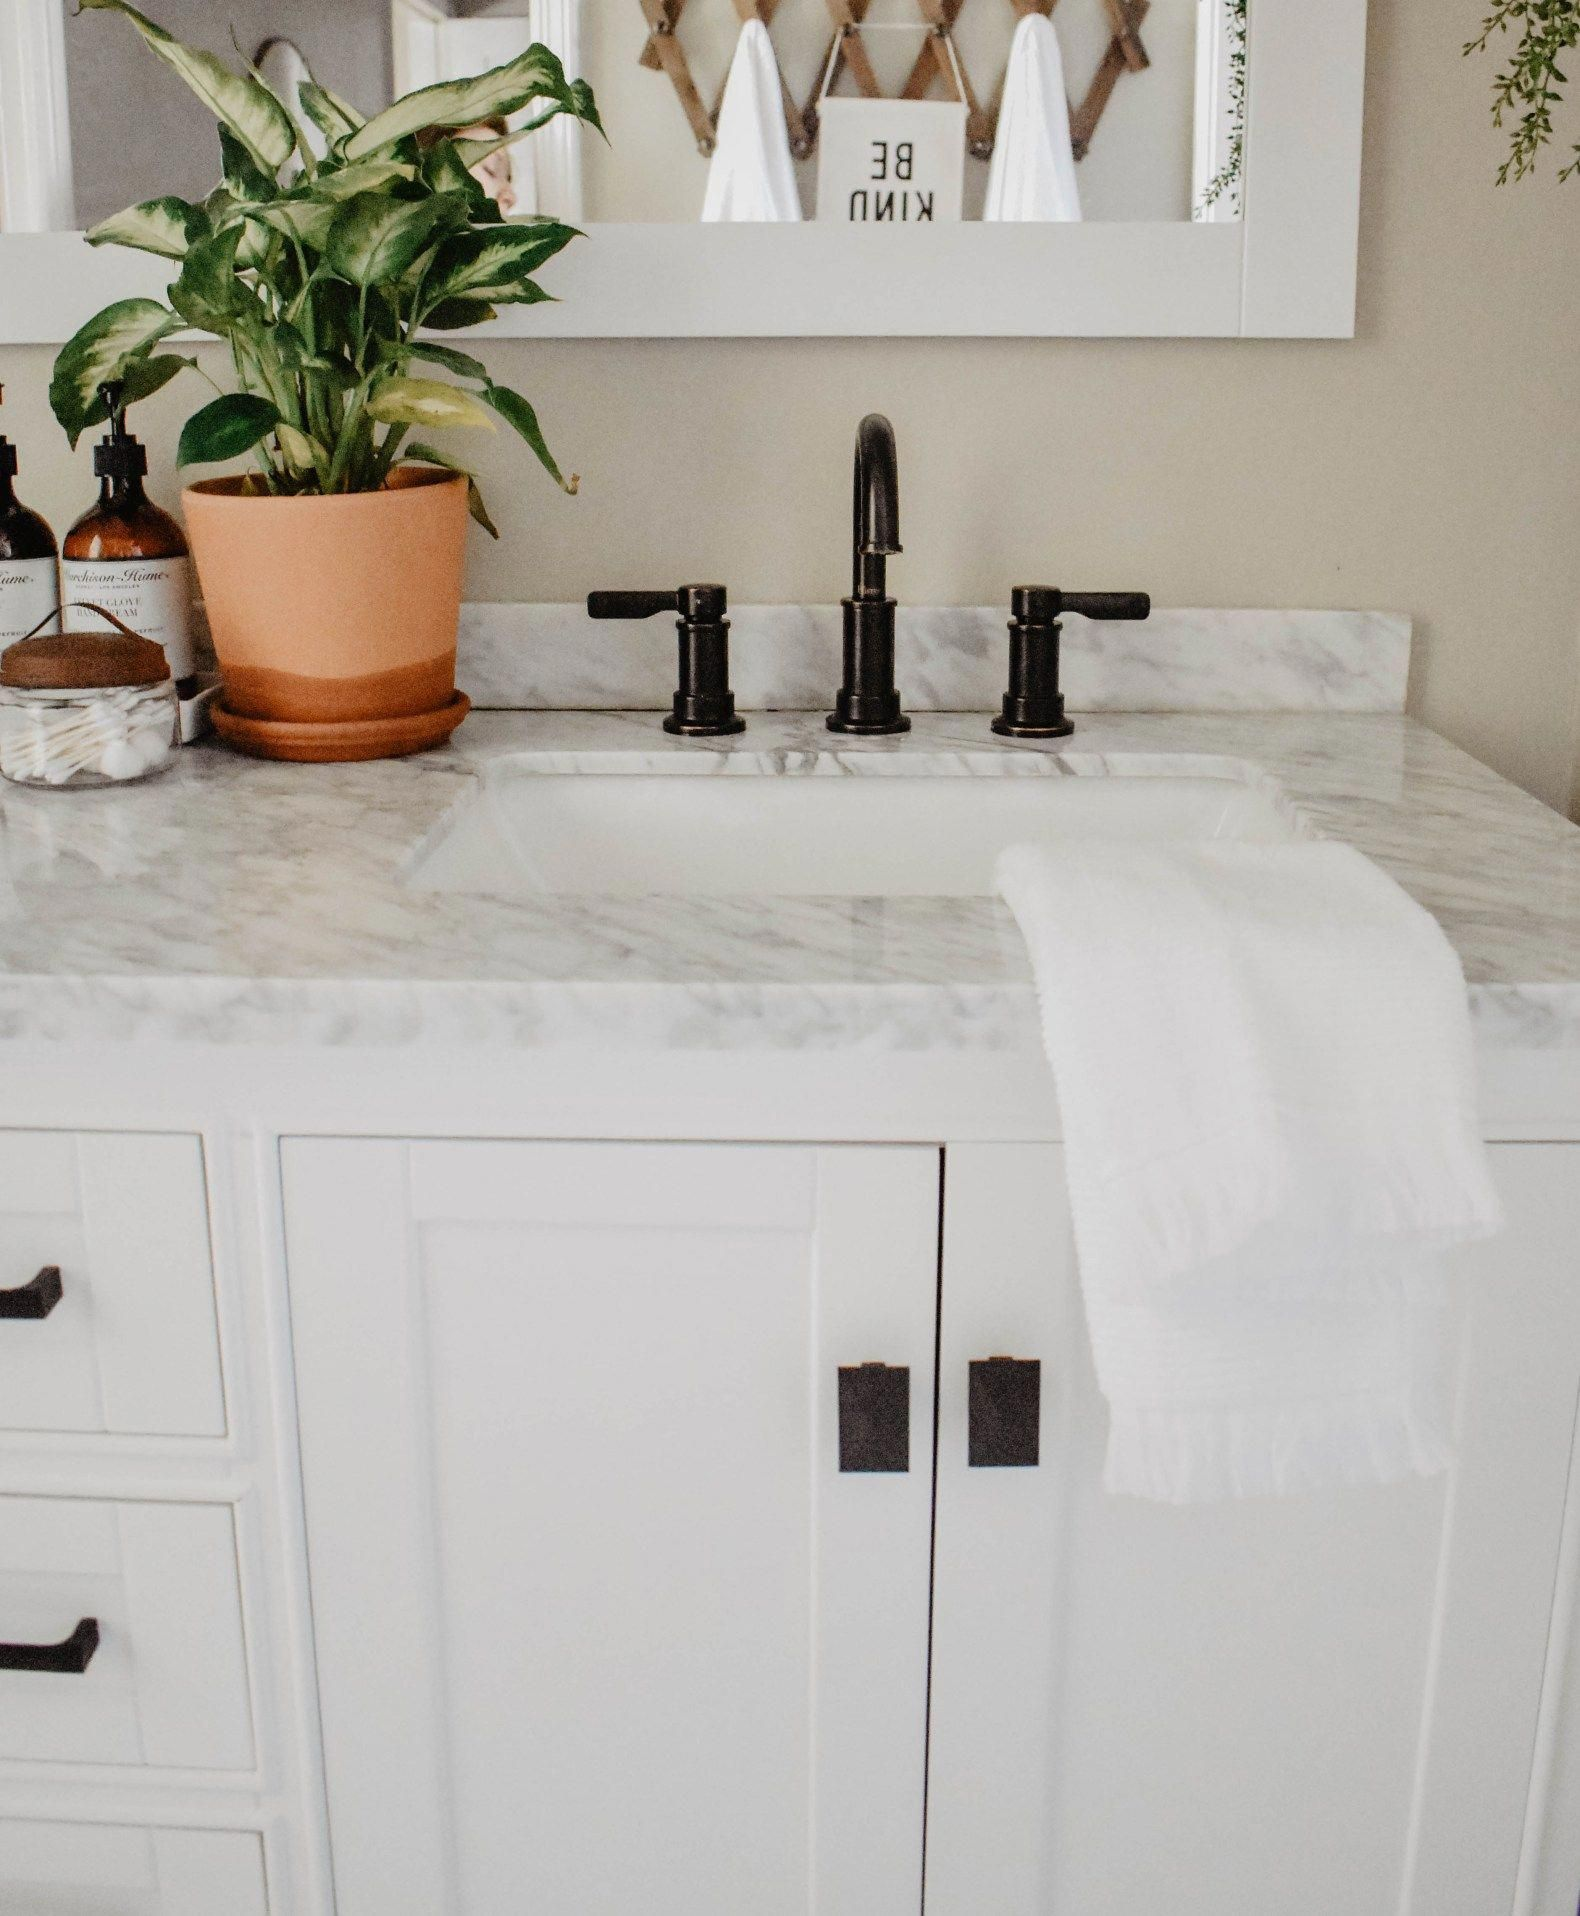 Zen Bathroomdesign Ideas: Male Bathroom: 60 Decorating Ideas With Photos And Designs